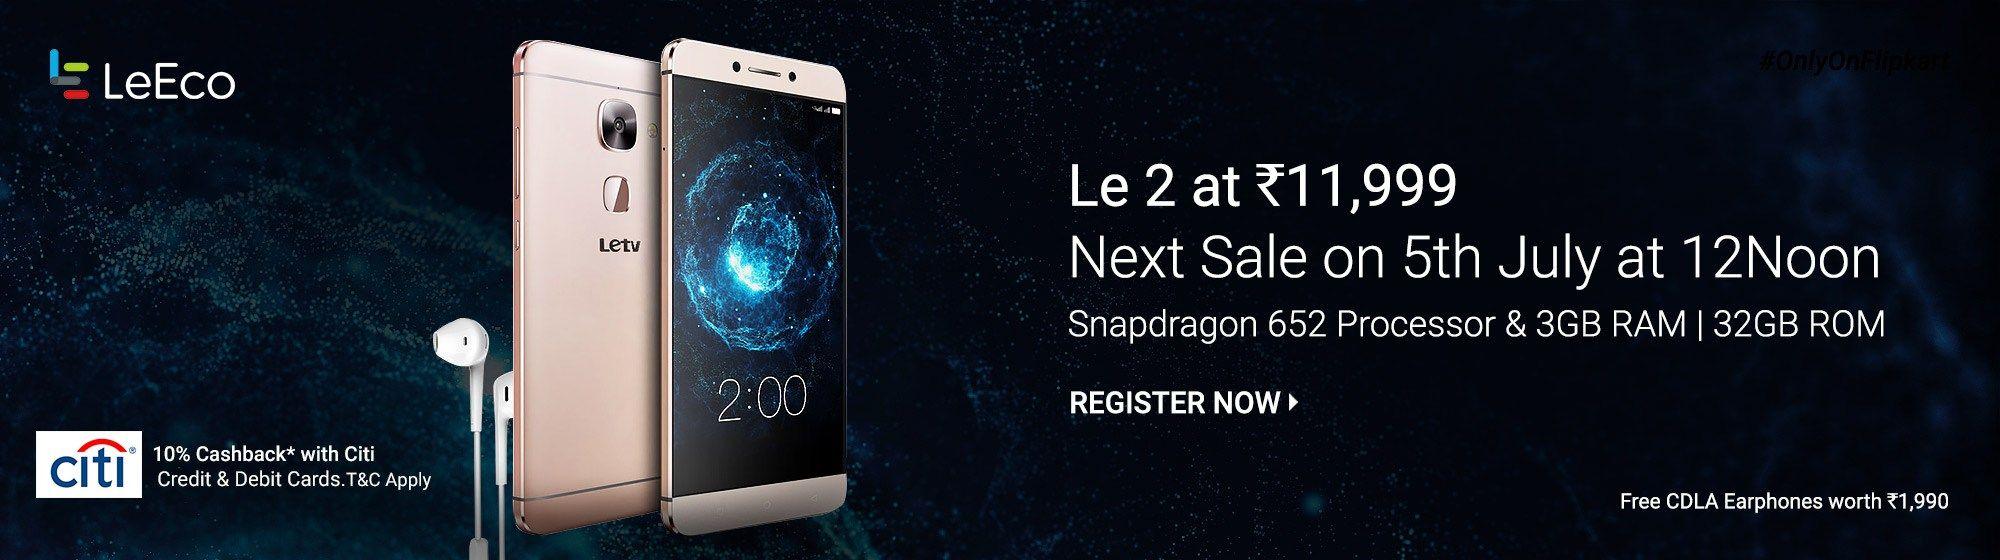 Eid Mobile , Smartphone Sale Offer : Flipkart , Snapdeal , Amazon Eid Offer